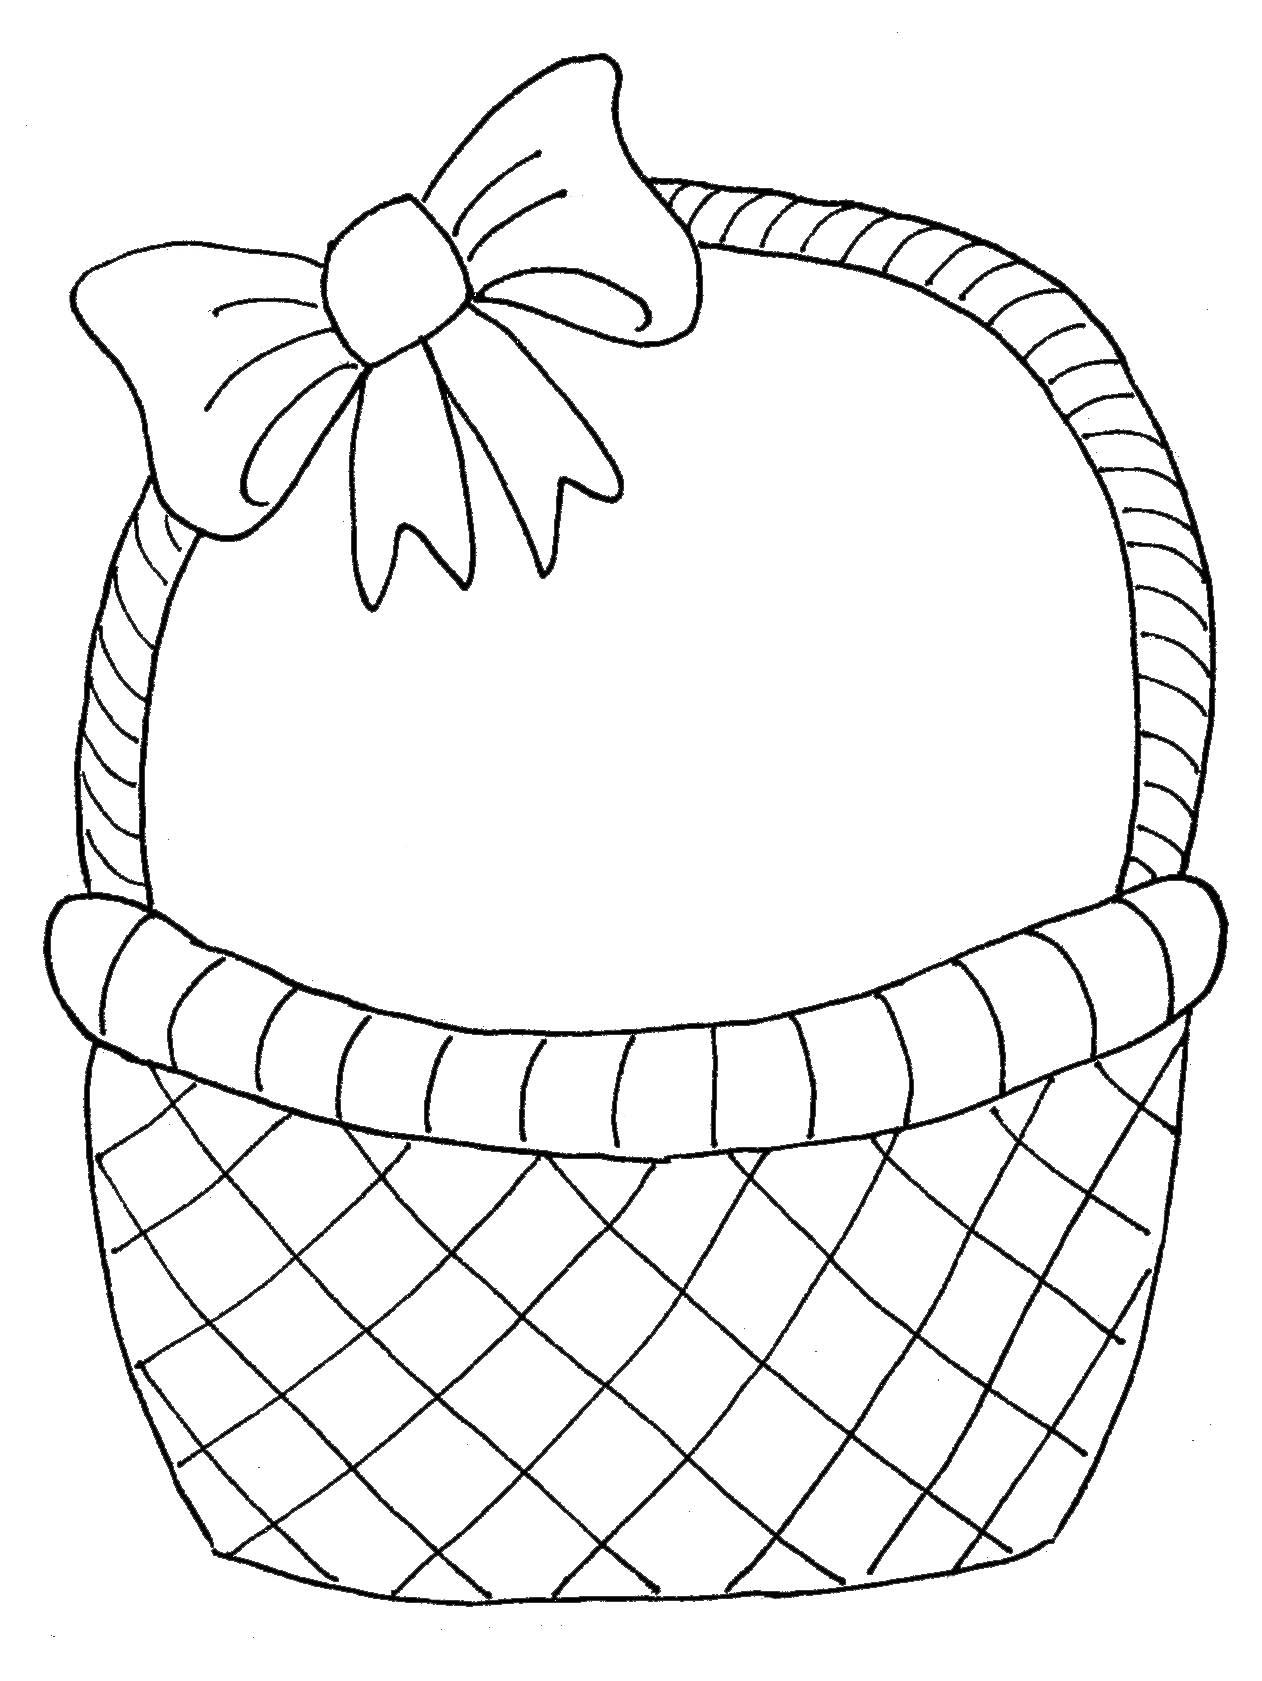 Basket clipart simple. Drawing at getdrawings com